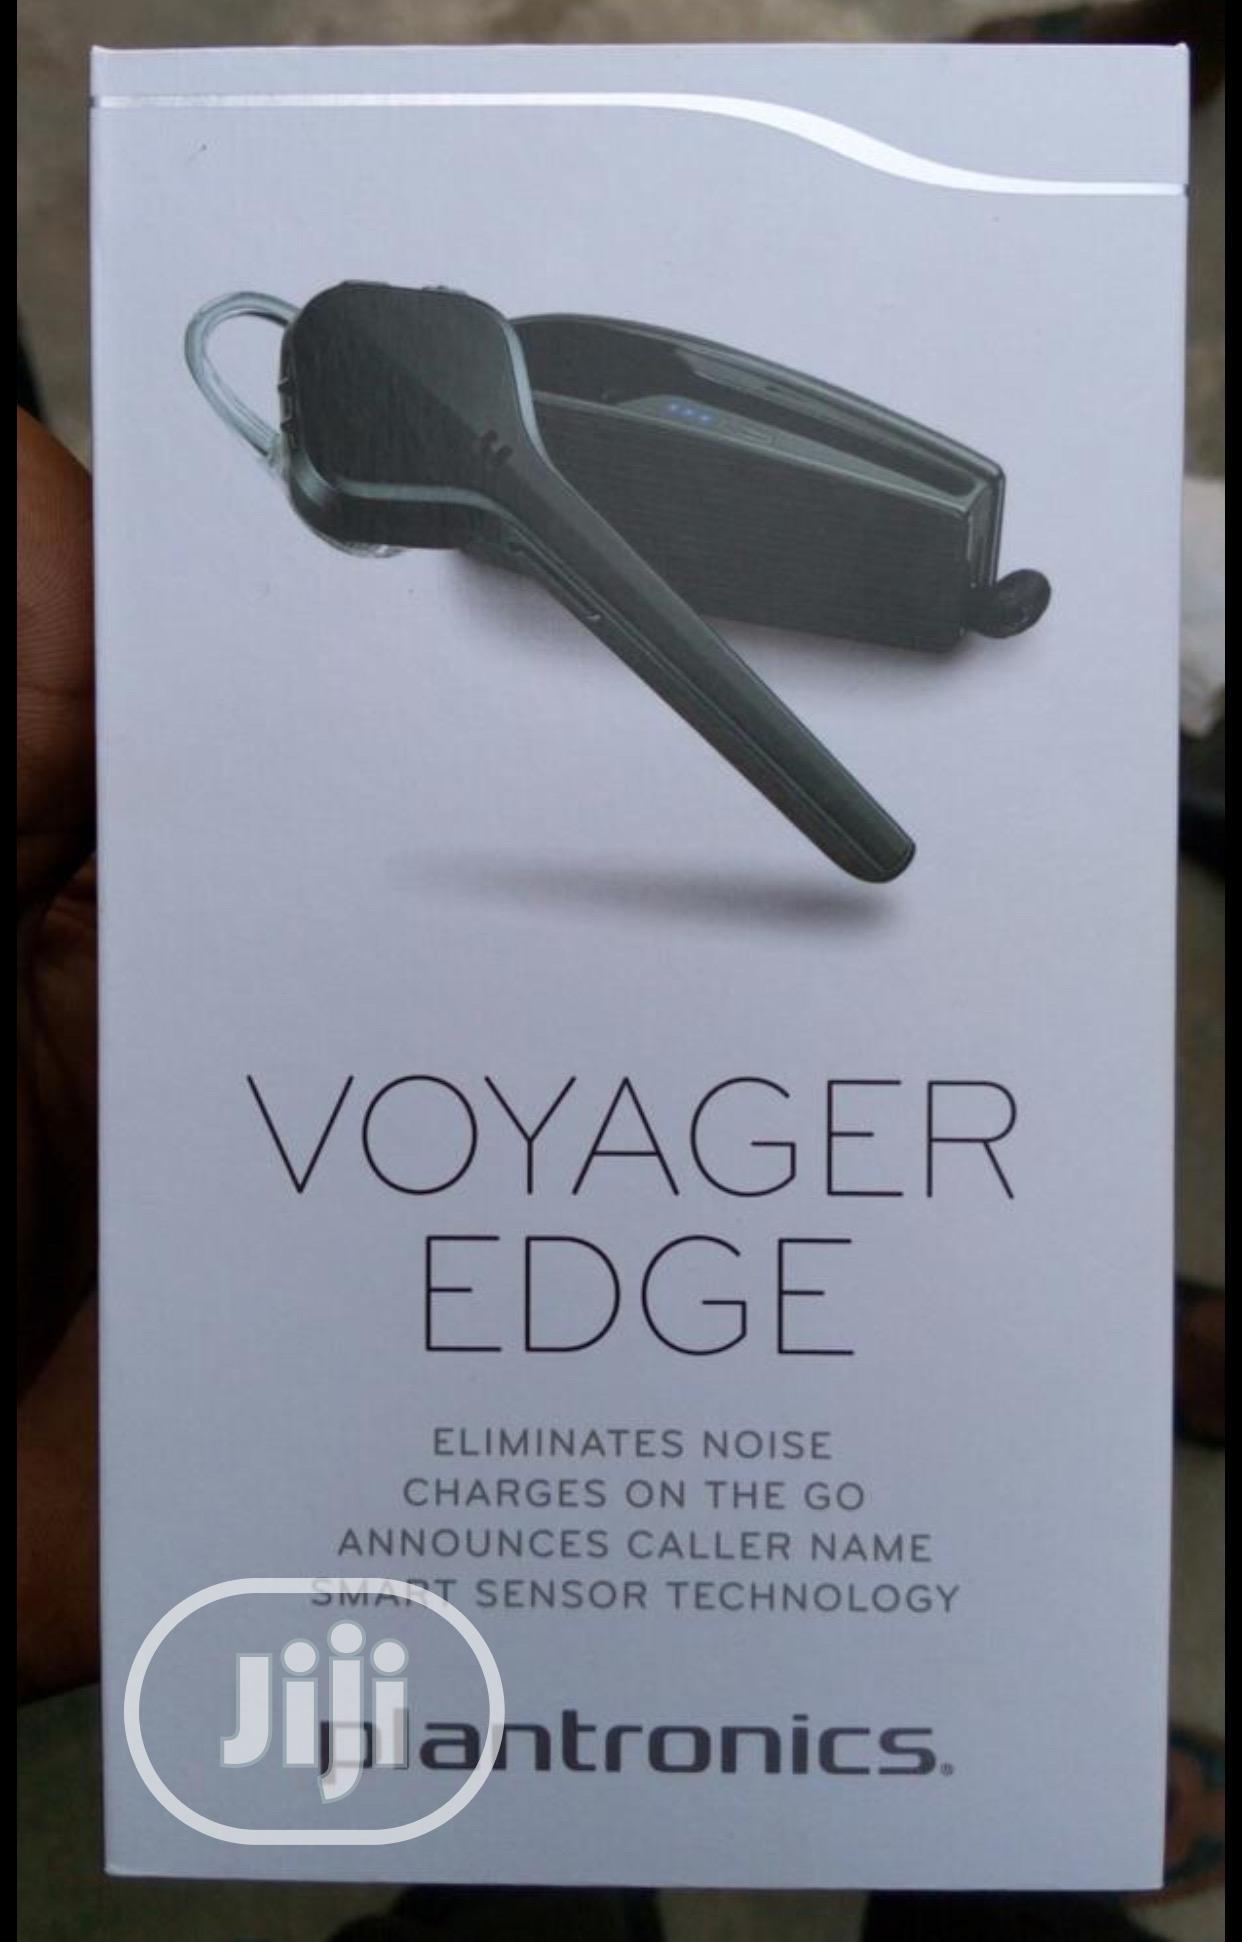 Plantronic Voyager Edge Bluetooth